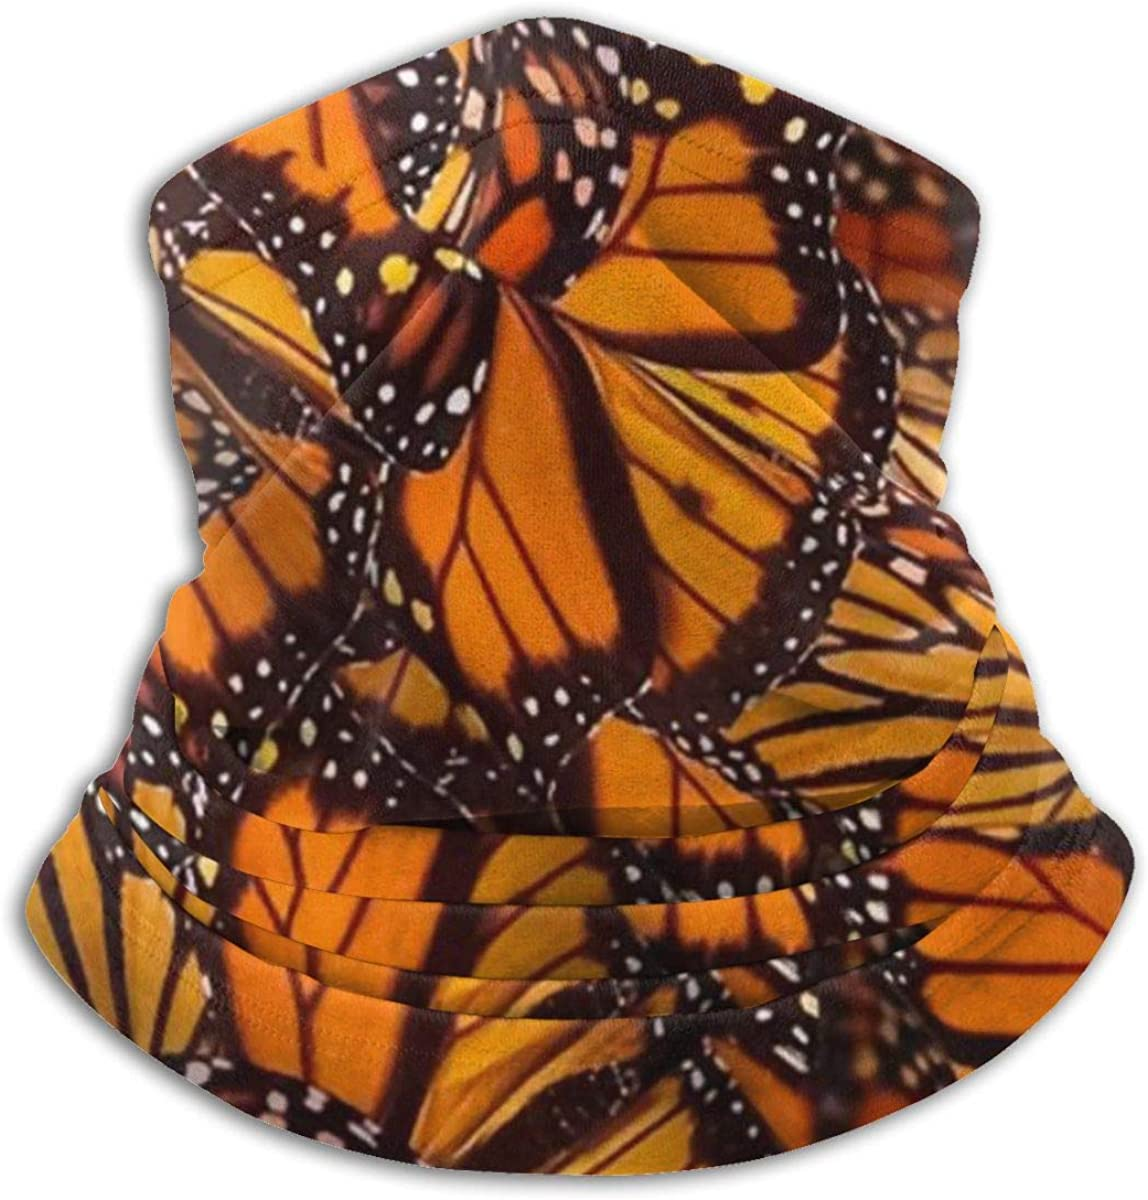 SARA 2021new shipping free NELL Neck Gaiter Headwear Face Bandana Sun Recommendation Magic Scarf Mask